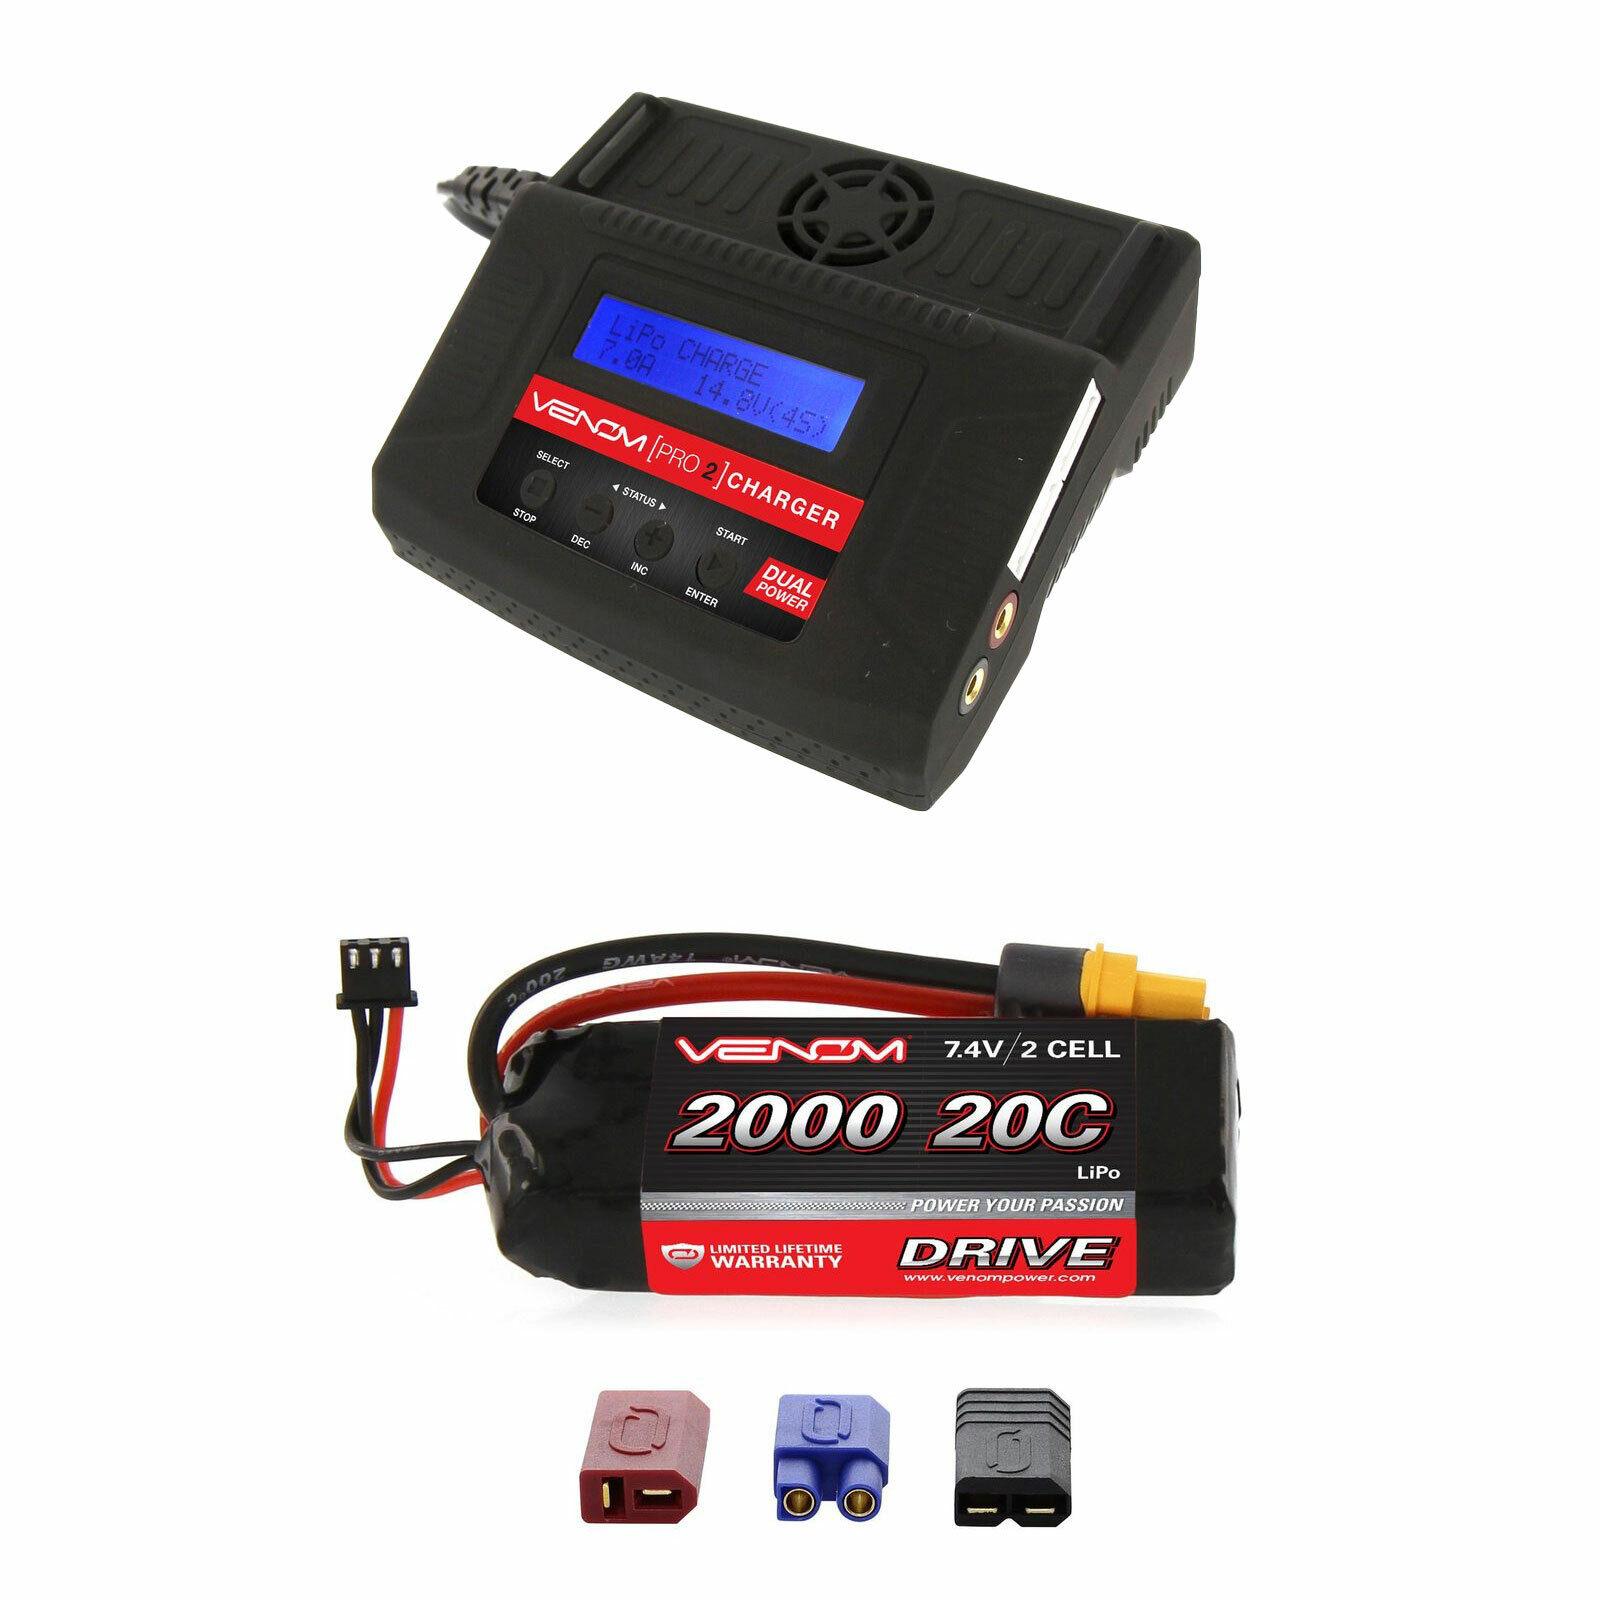 Venom 20C 2S 2000mAh 7.4V LiPo Battery and Pro 2 Charger Combo